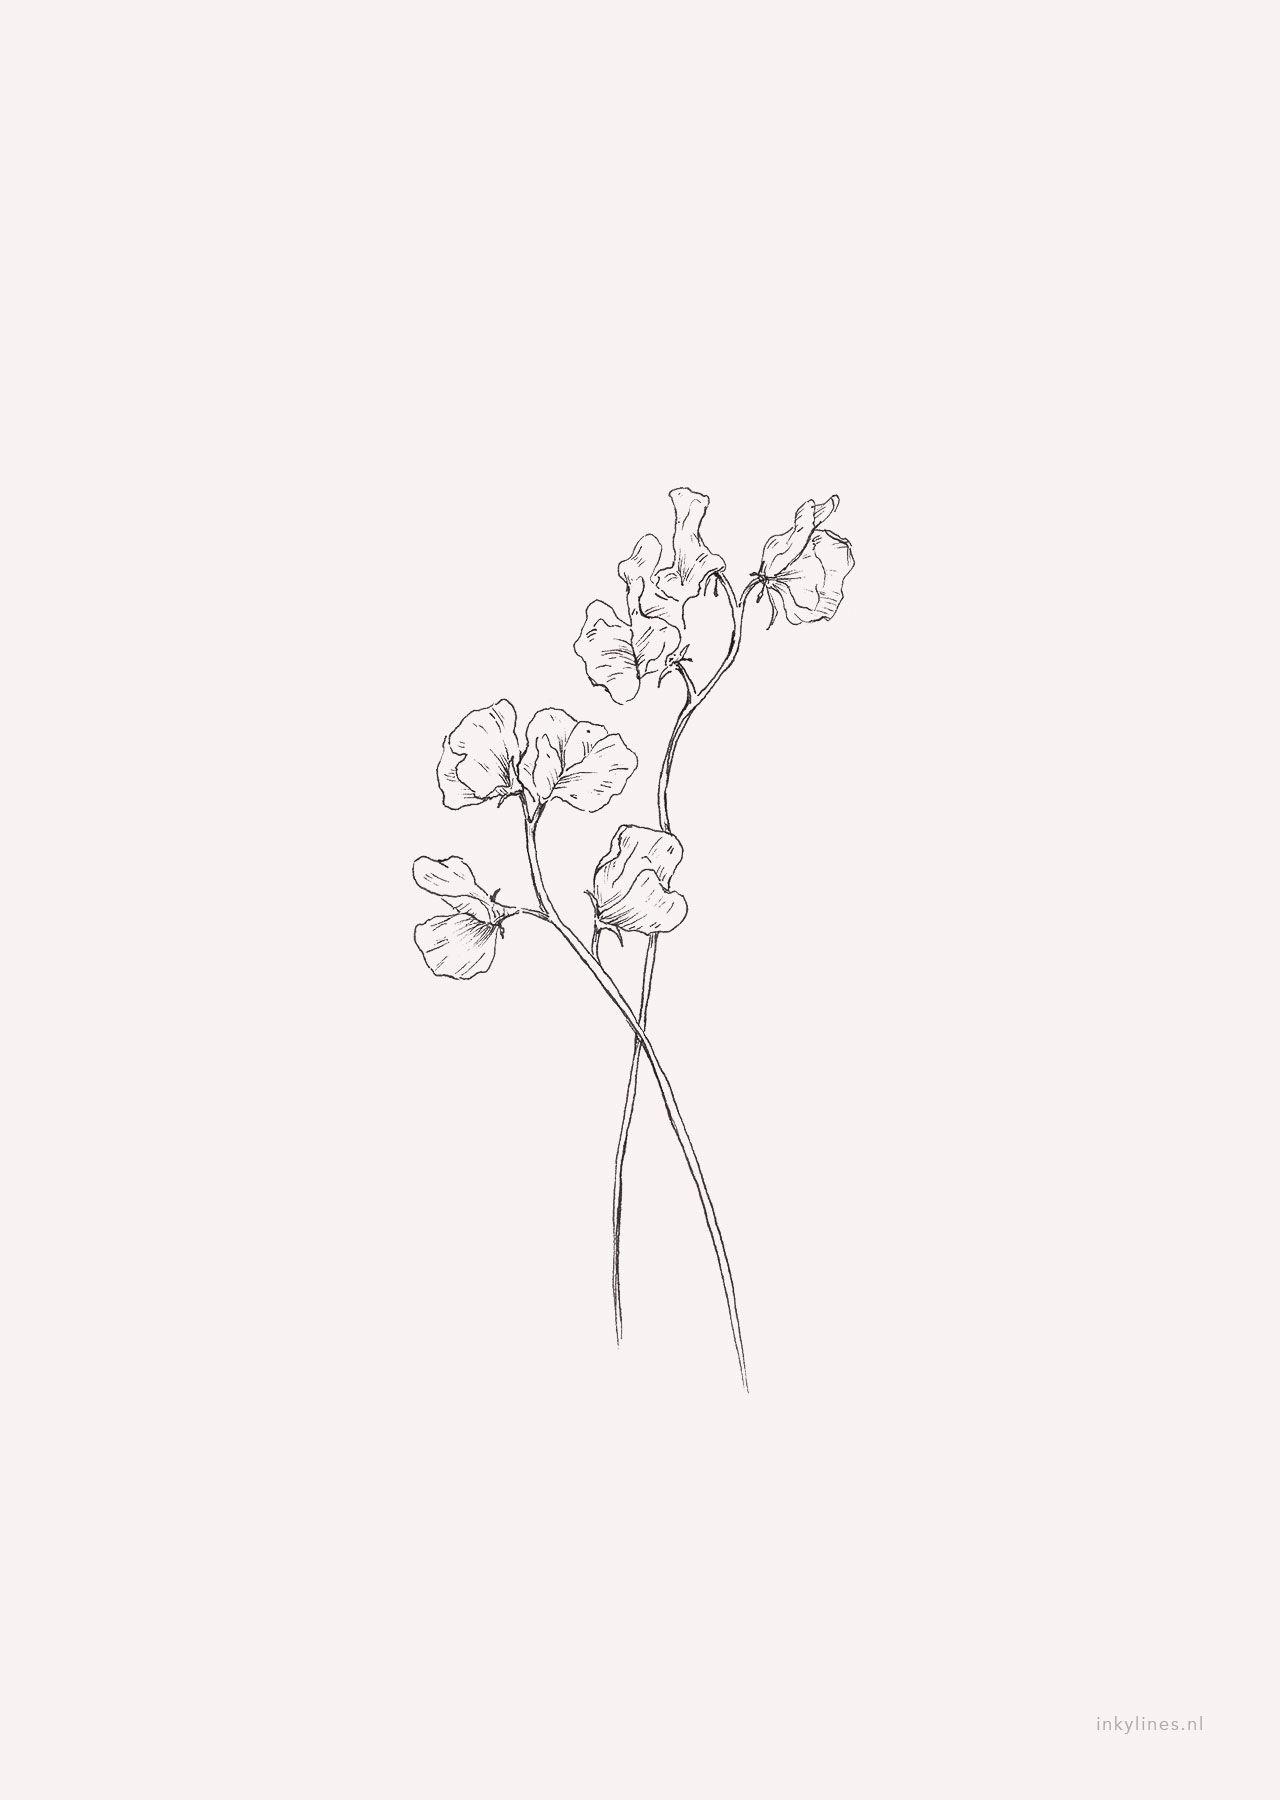 Sweet Pea Sweet Pea Tattoo Pencil Drawings Of Flowers Floral